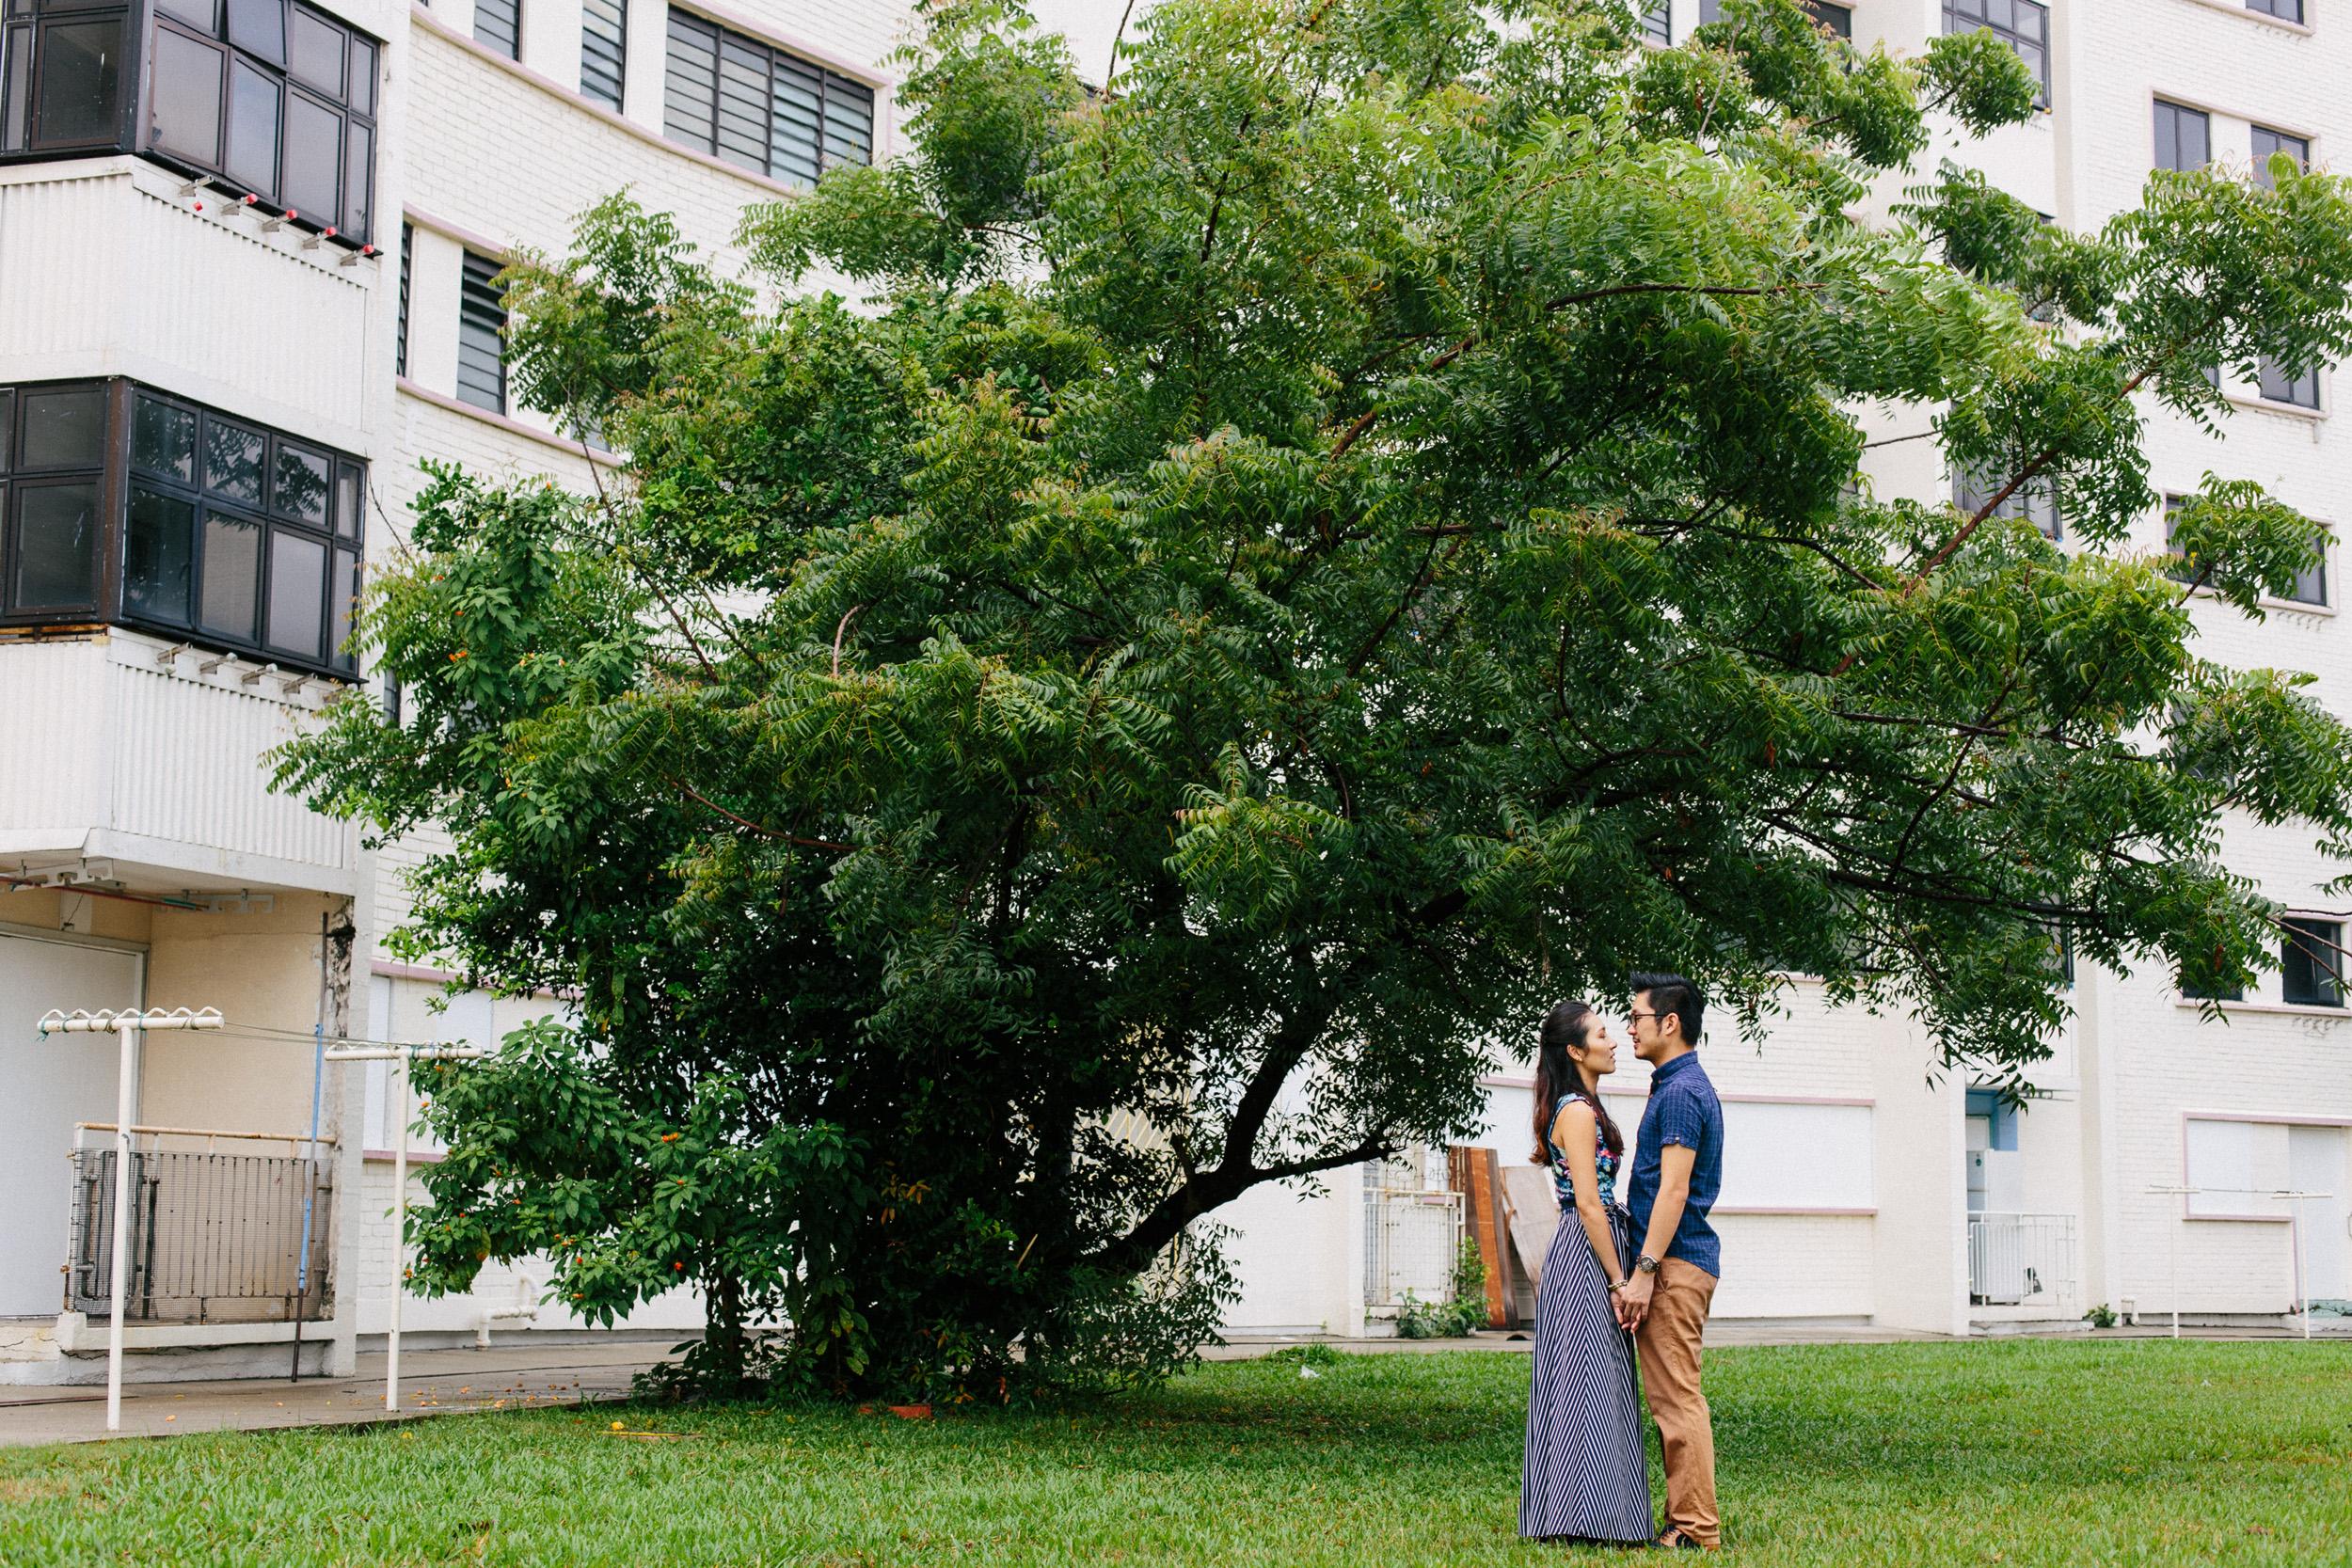 singapore-wedding-photographer-photography-wmt2017-087.jpg